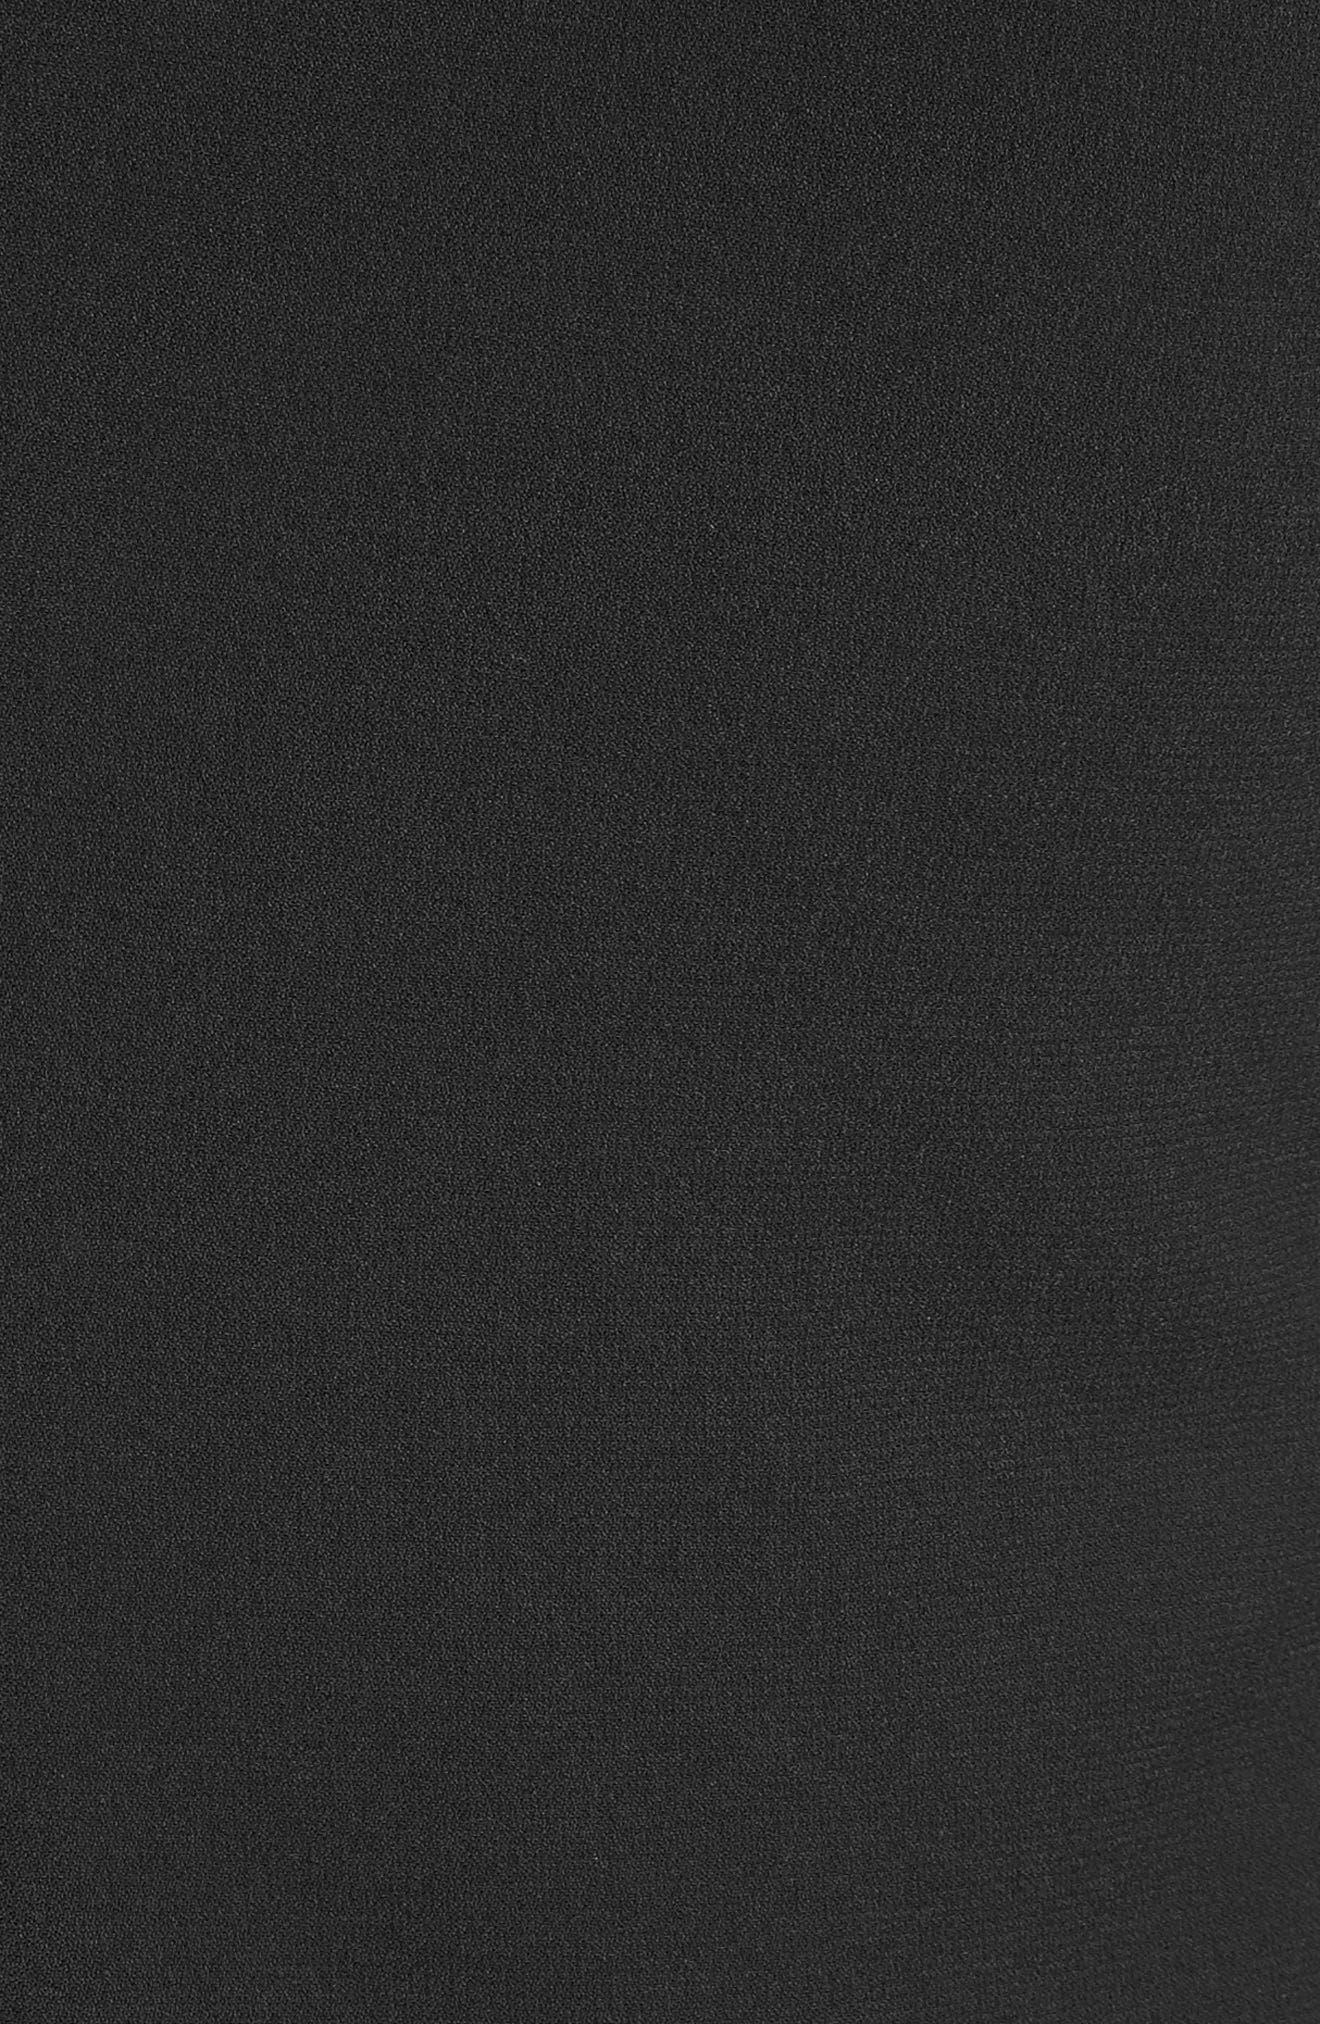 Beaded Maxi Dress,                             Alternate thumbnail 6, color,                             Black